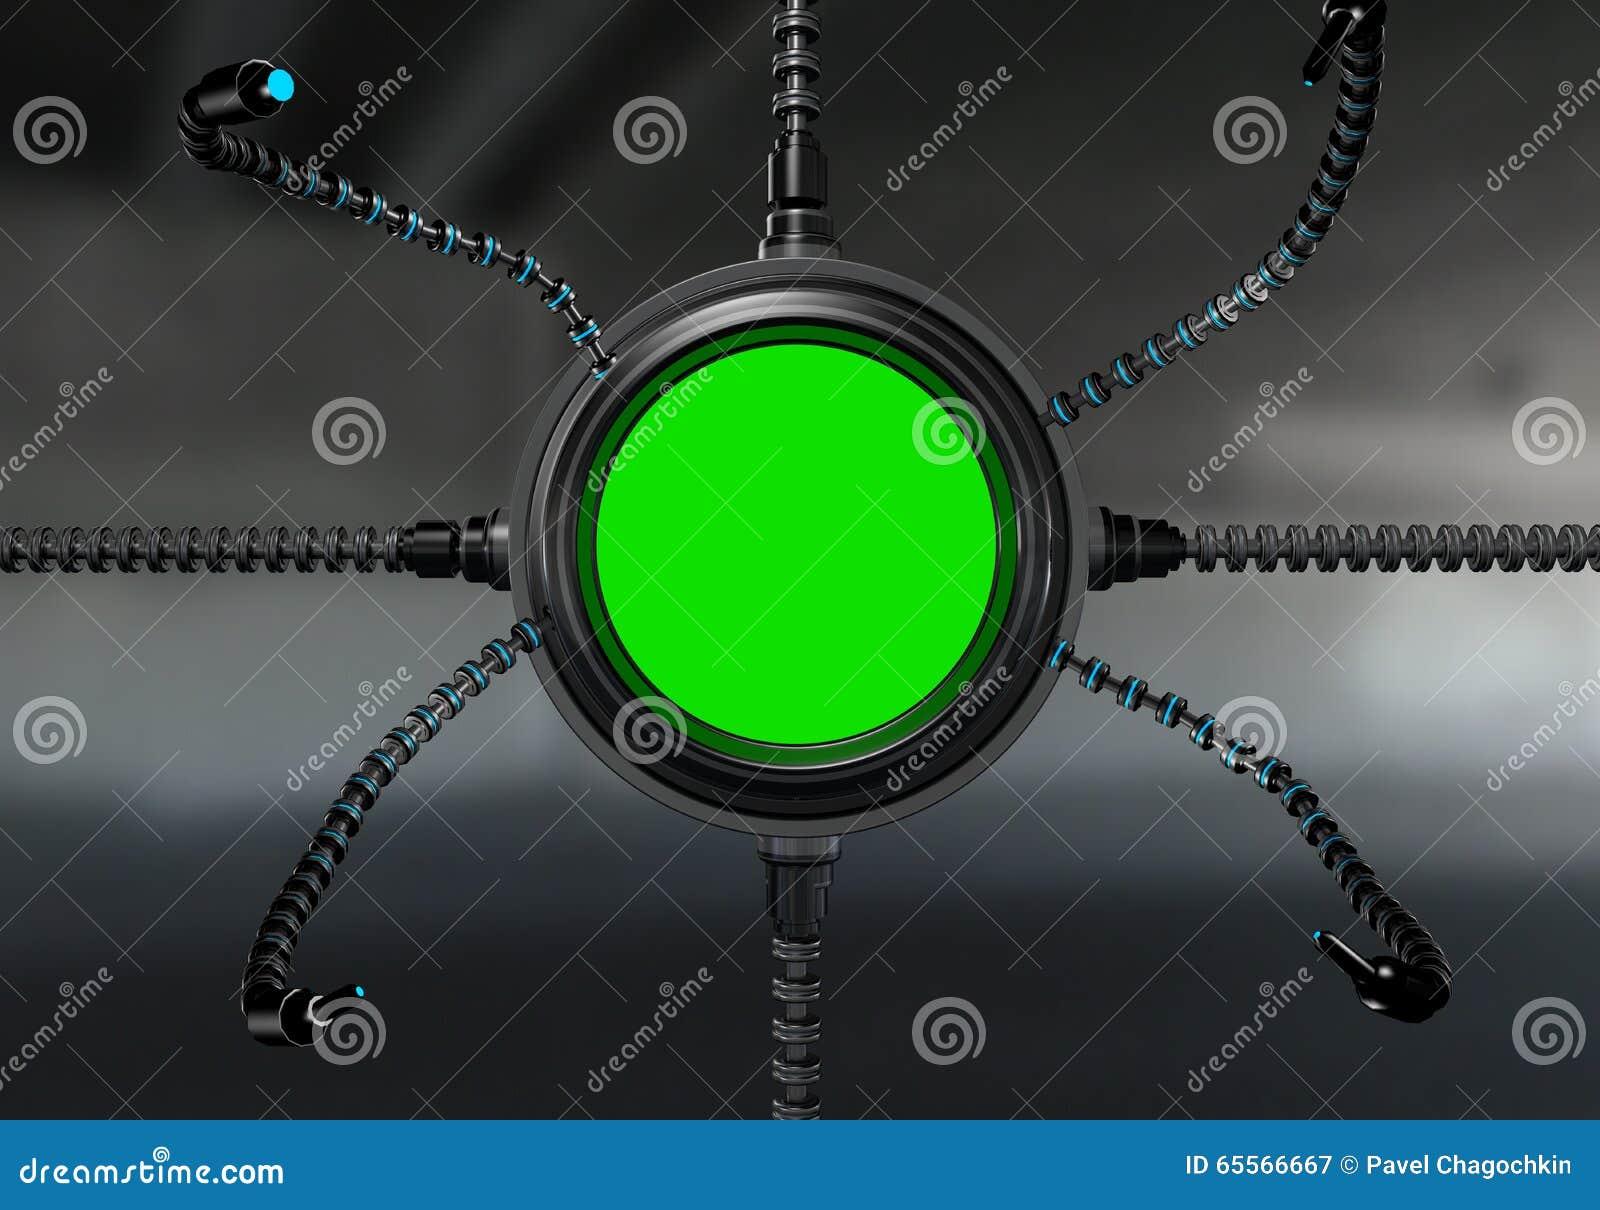 Futuristic sci-fi metal element . Futuristic monitor, display. Future concept.